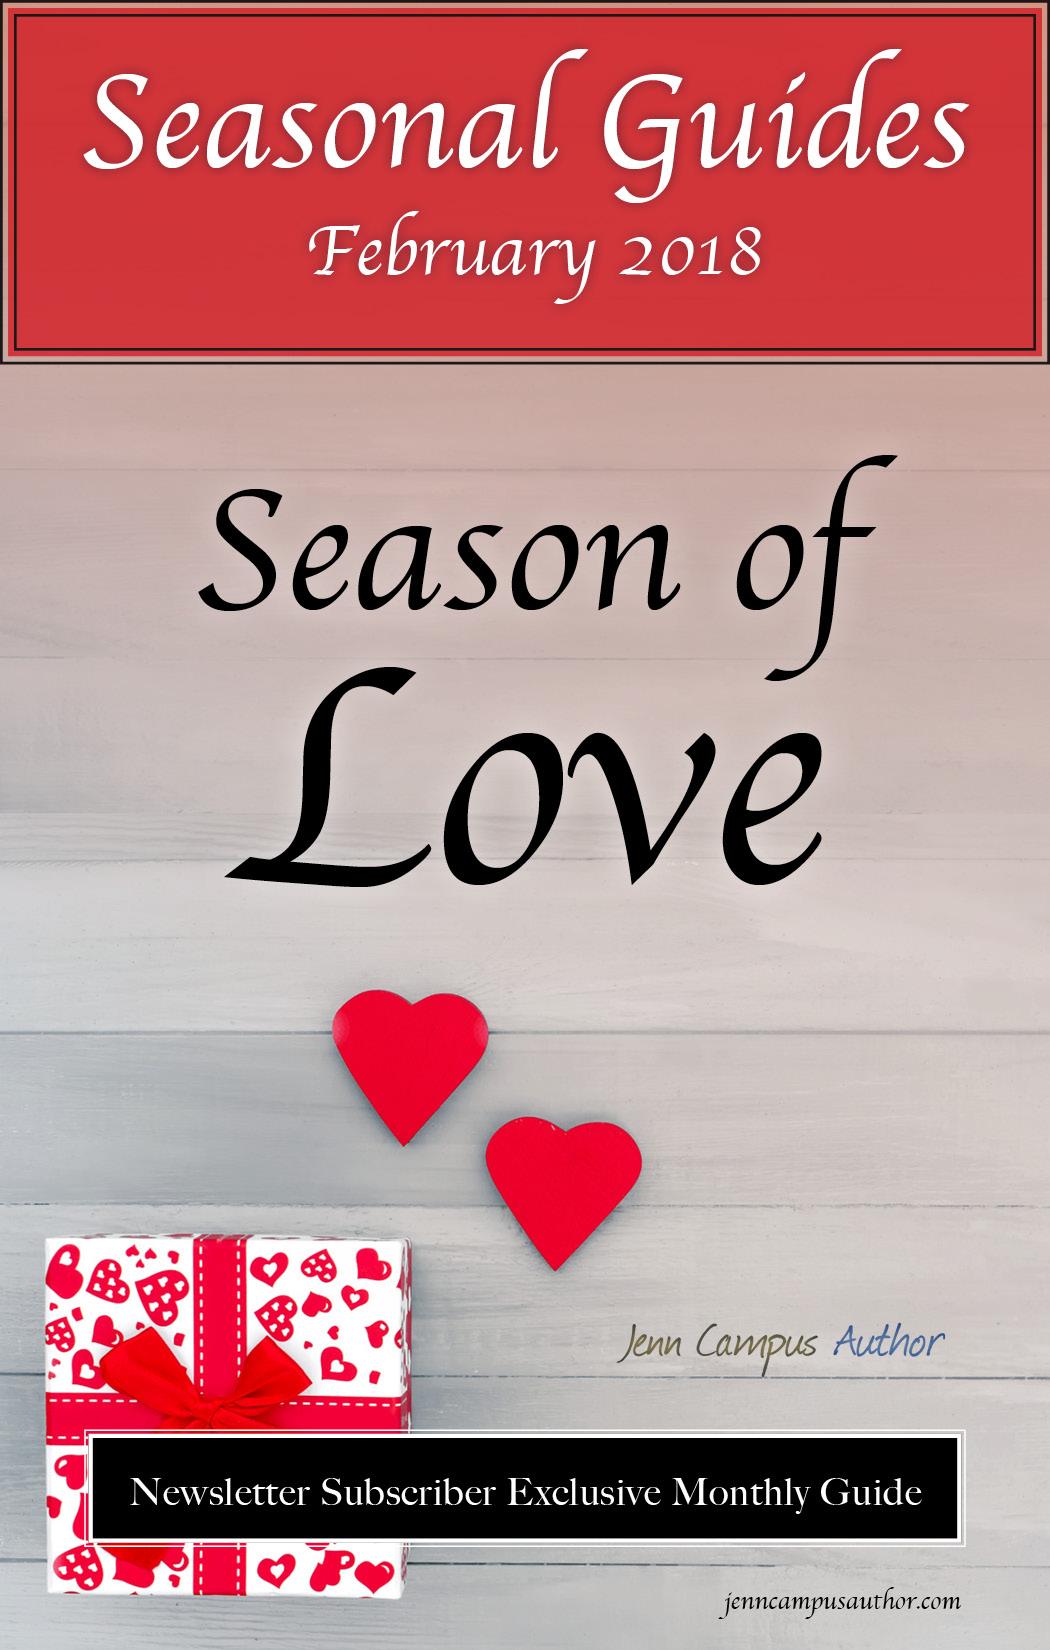 Seasonal Guide for February 2018 - The Season of Love